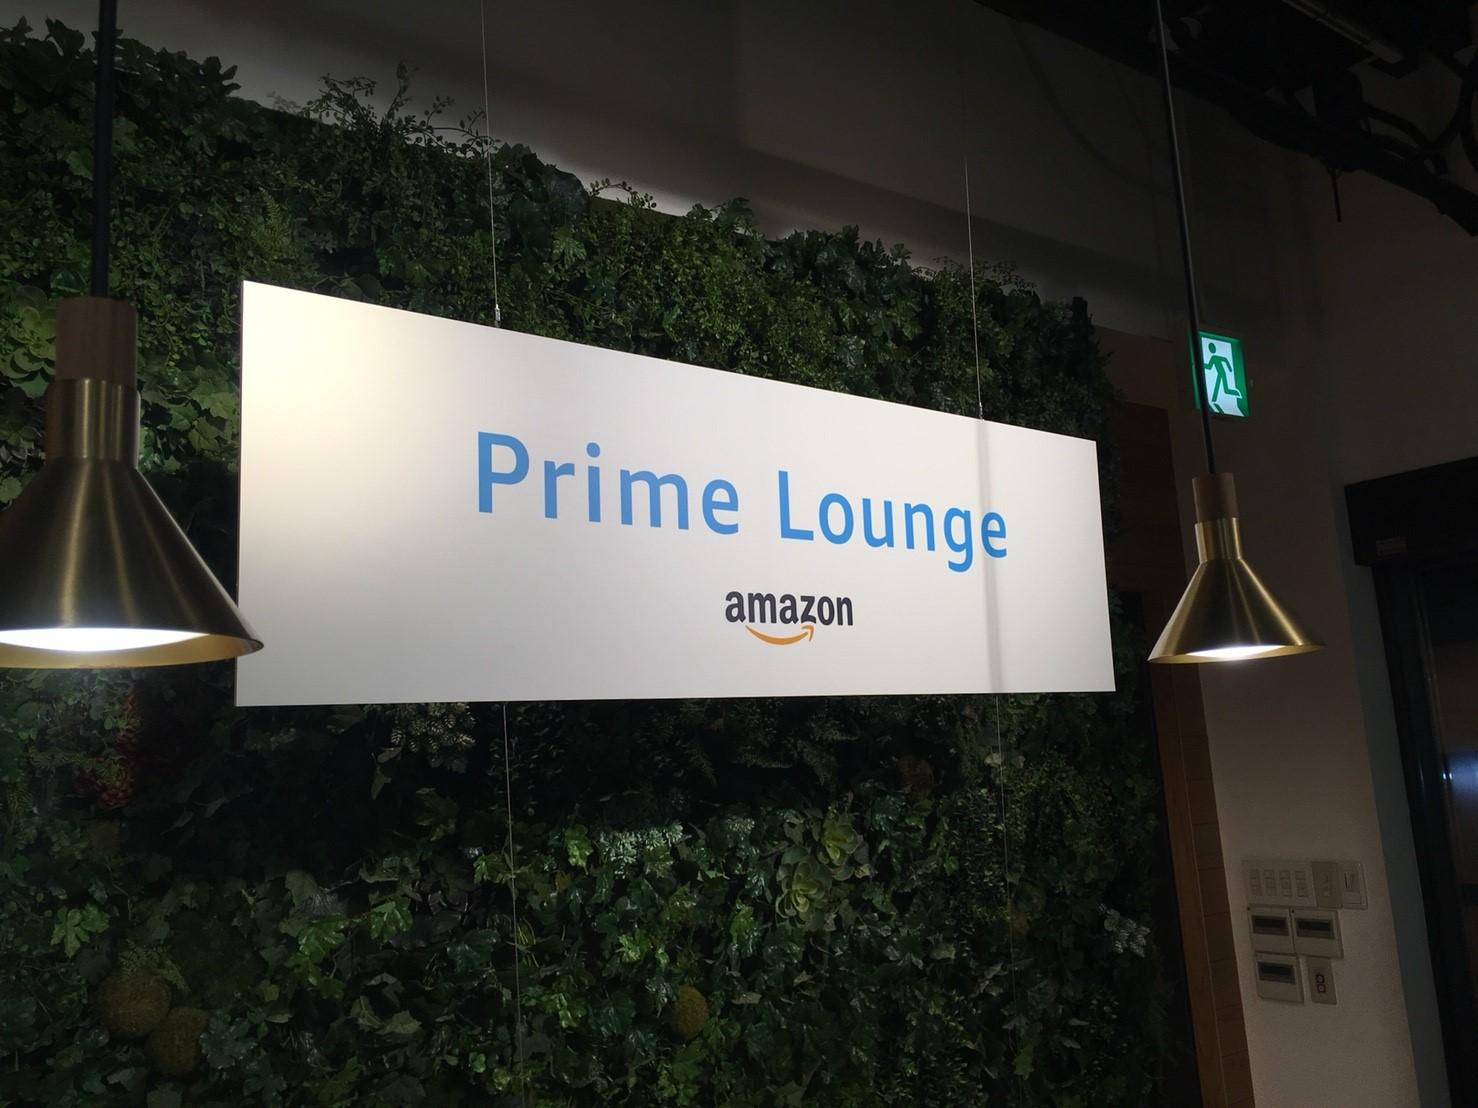 Amazon Prime Lounge 記者発表会・インフルエンサーイベント